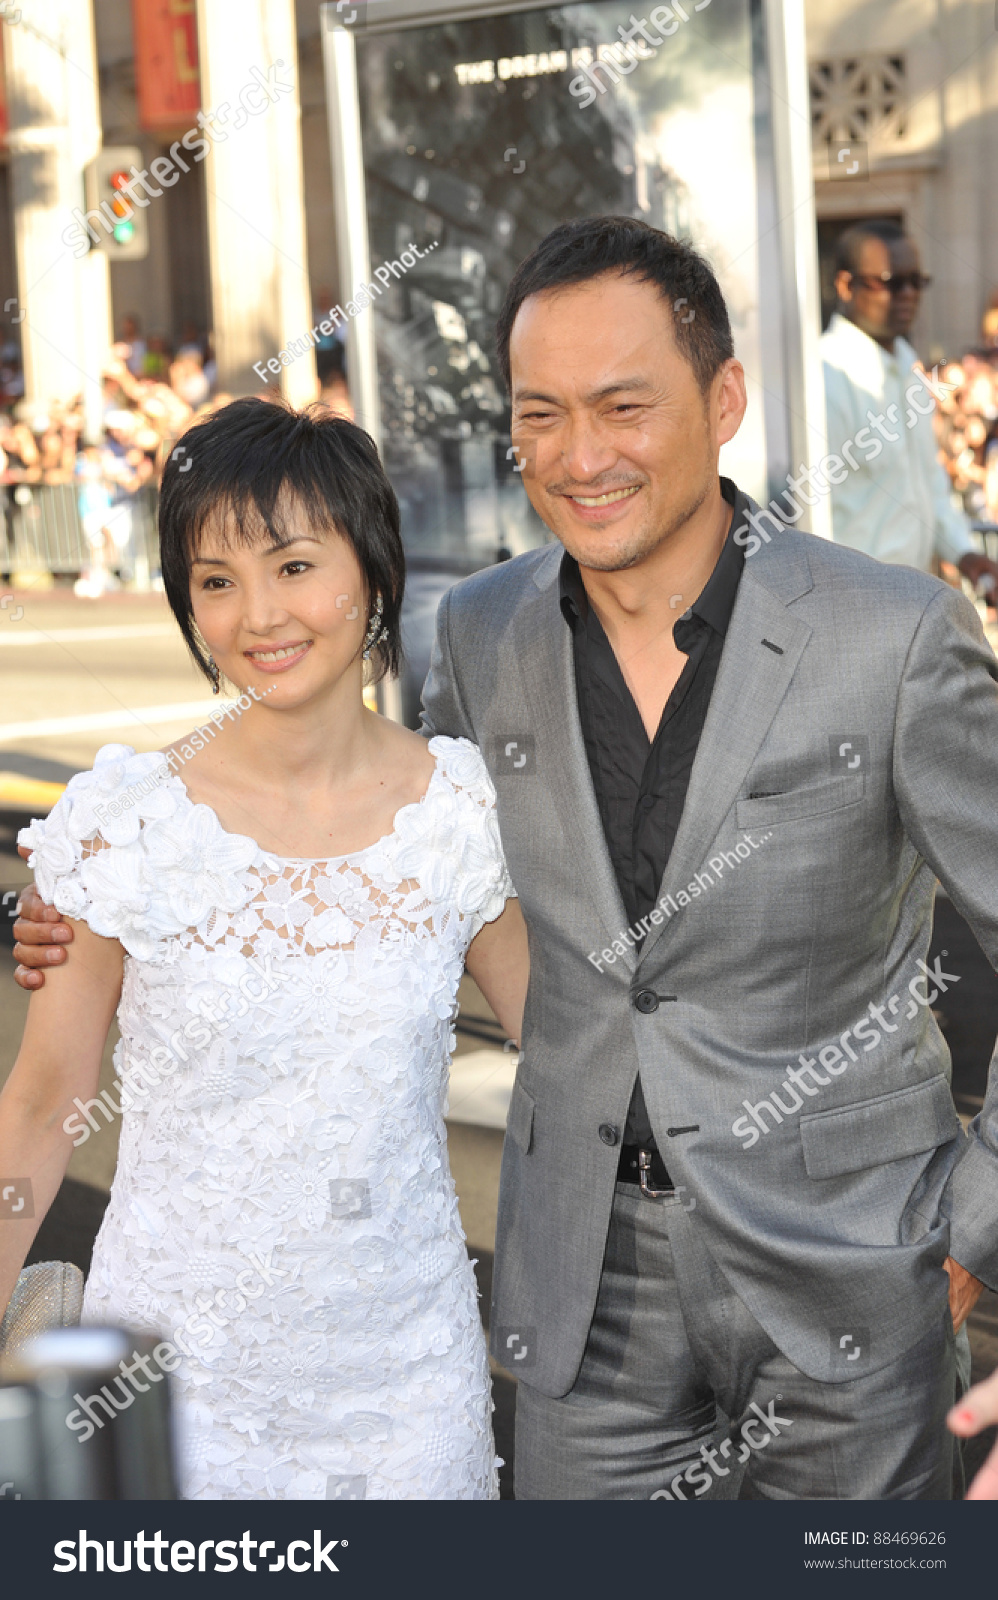 Ken Watanabe & Wife Kaho Minami - 595.7KB